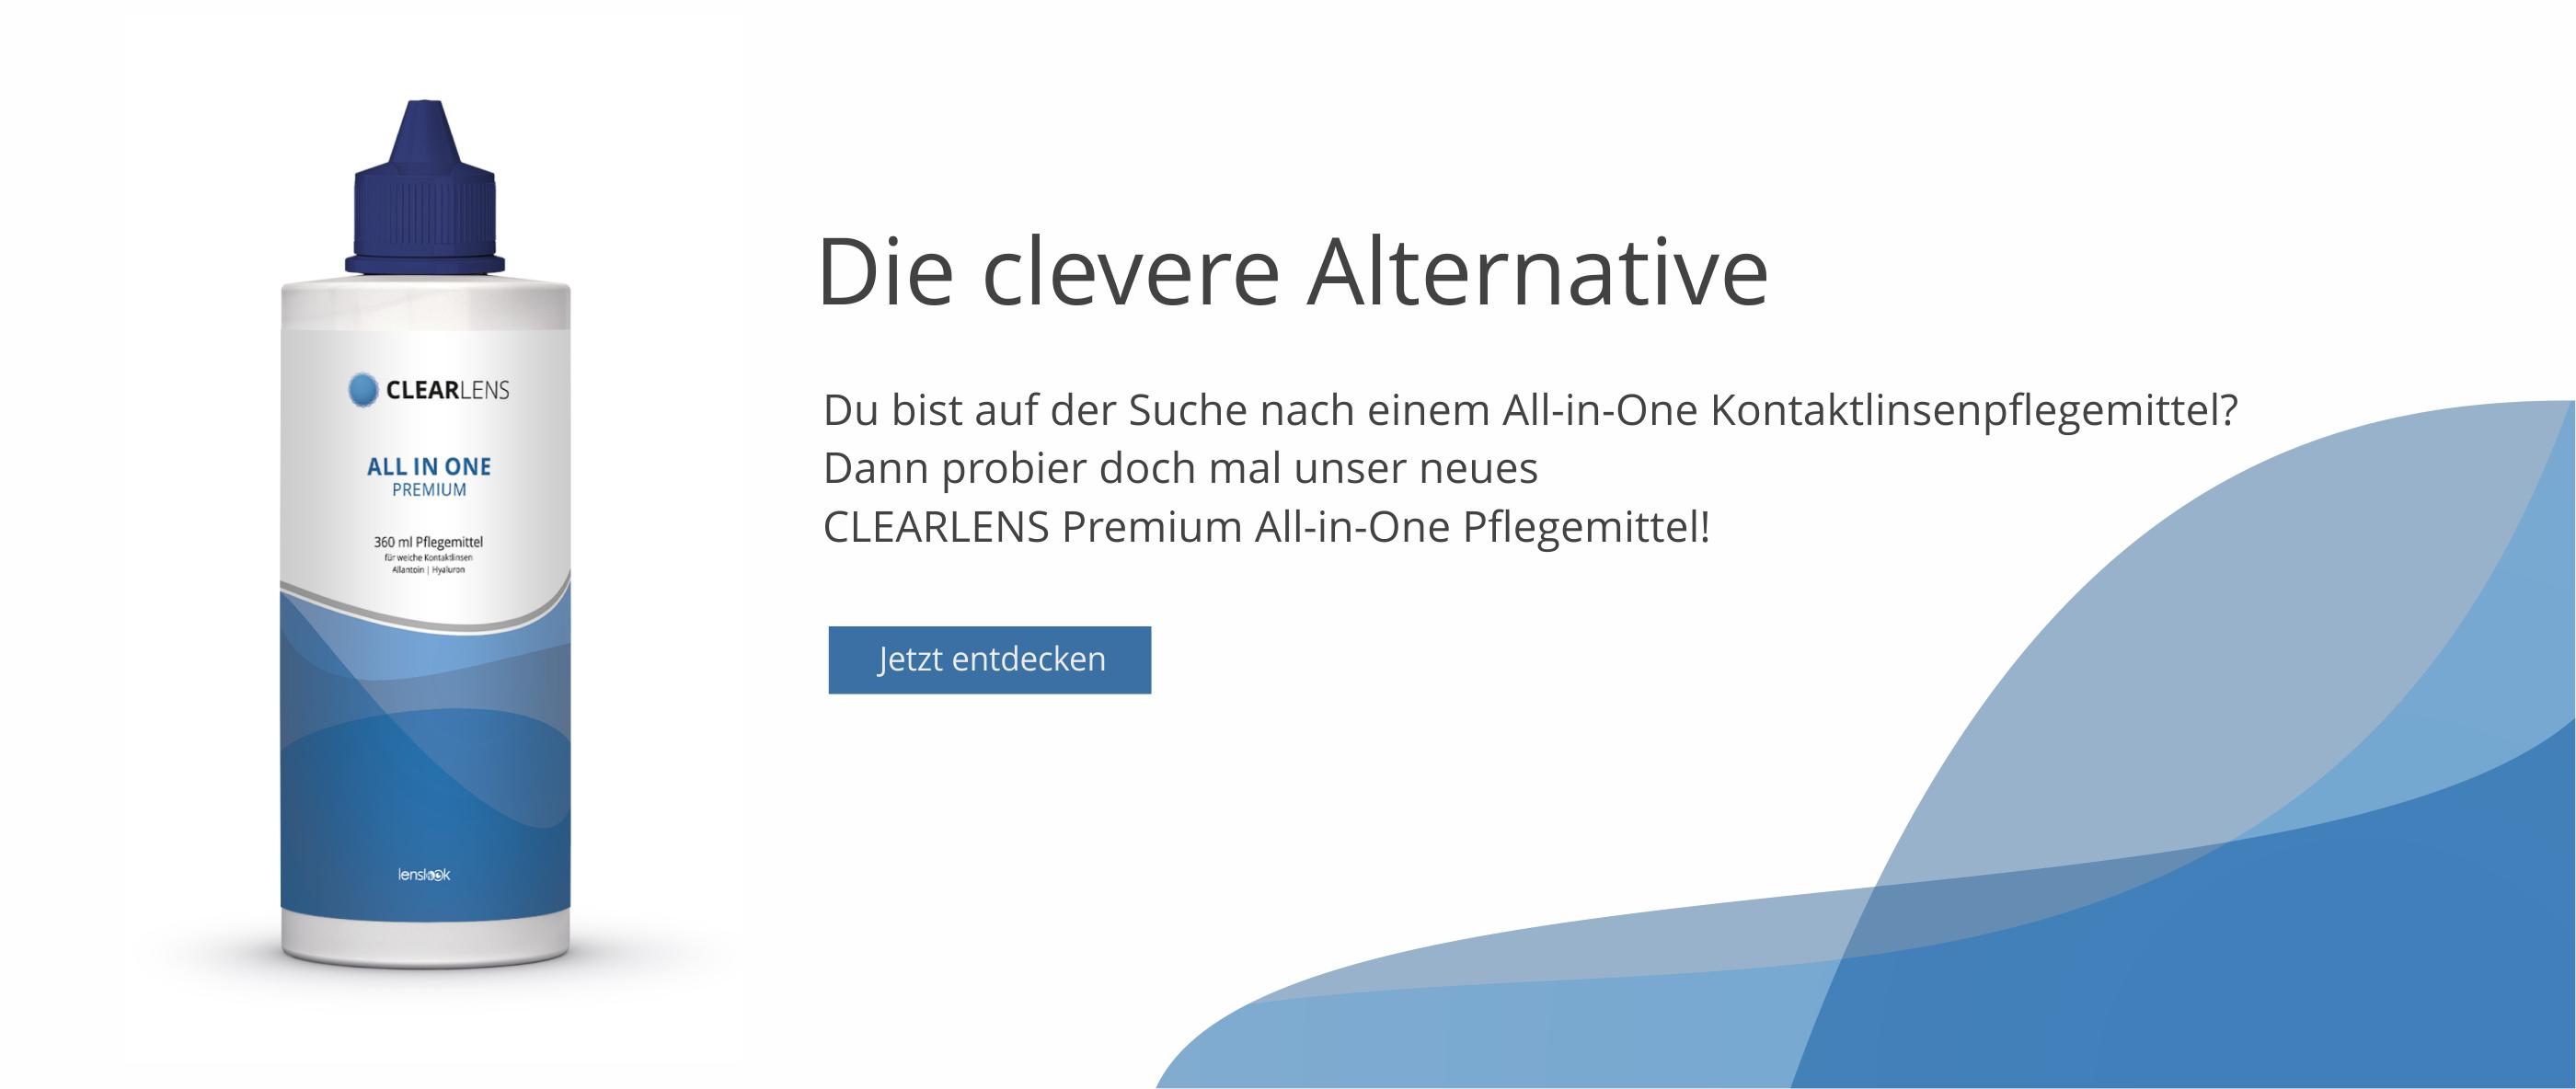 ClearLens_Alternative